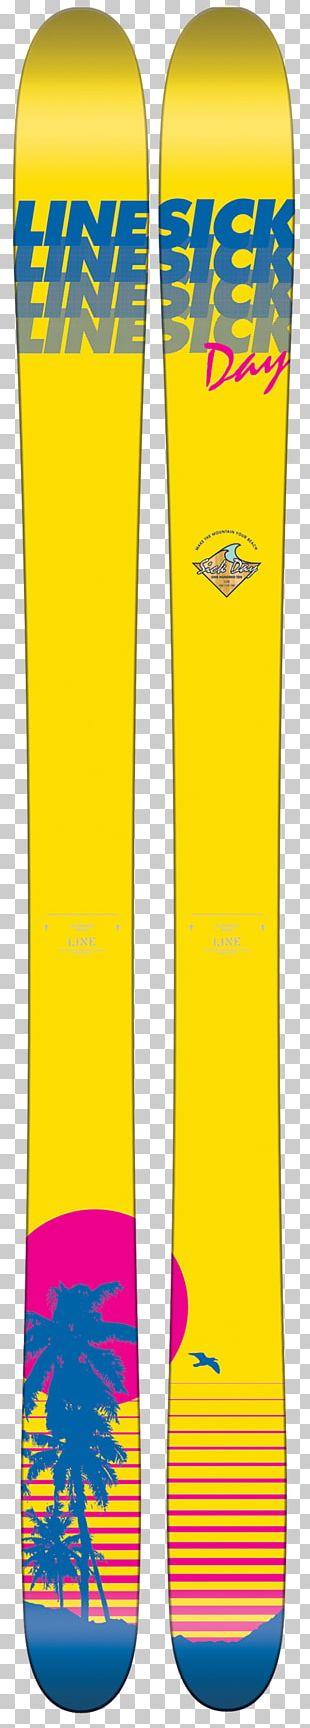 Twin-tip Ski Line Skis Armada Sporting Goods PNG